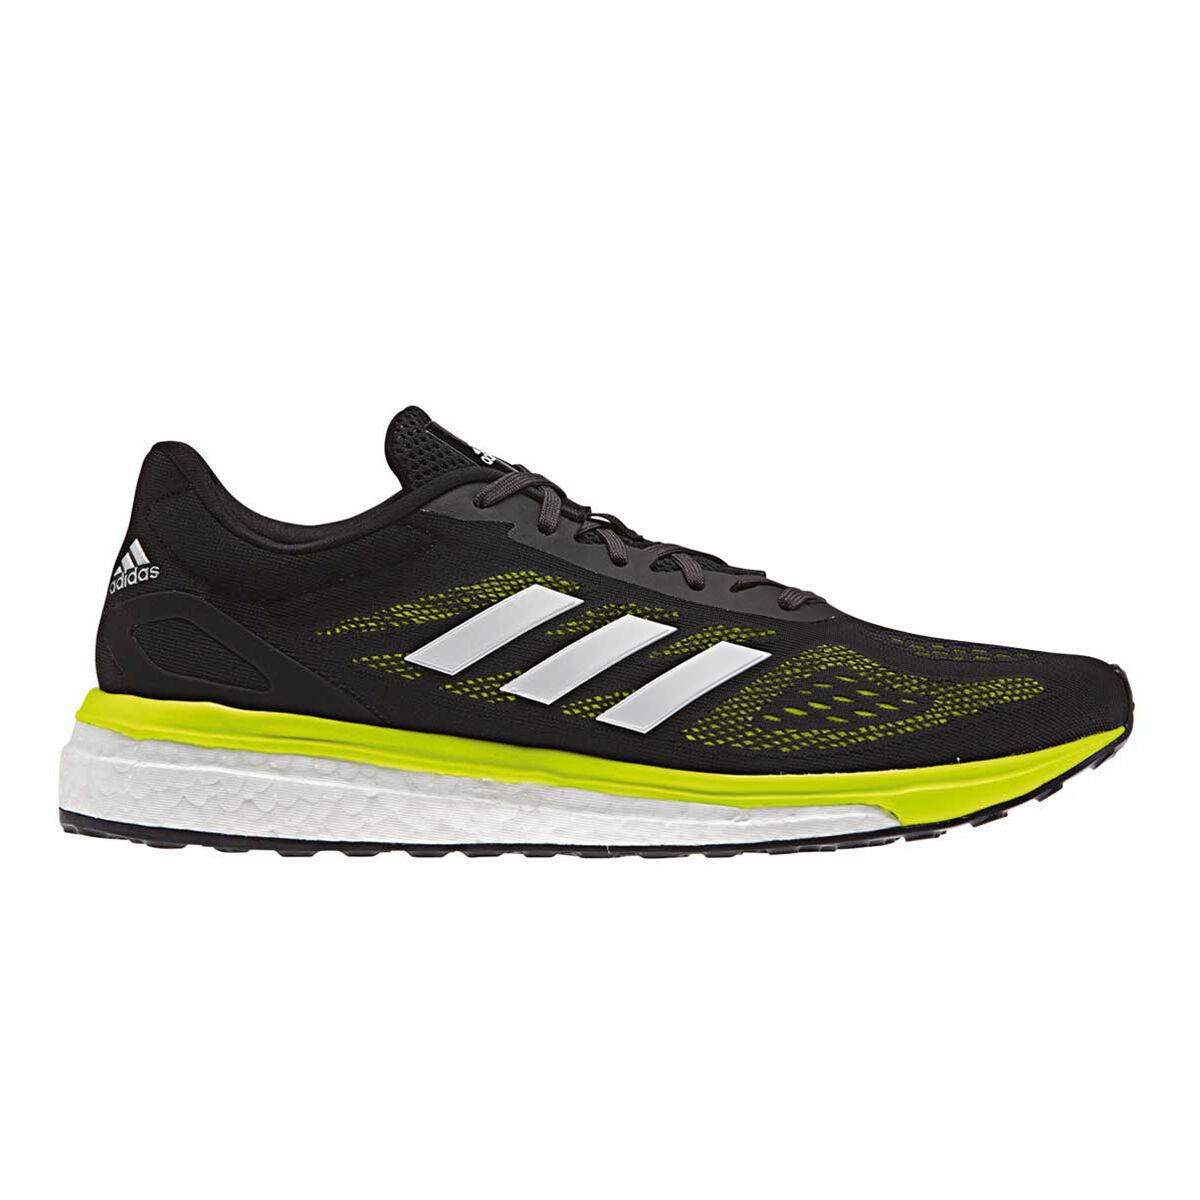 Response Adidas Rebel Running Yellow Black Sport Lt 7 Shoes Mens Us ZqwC1qg